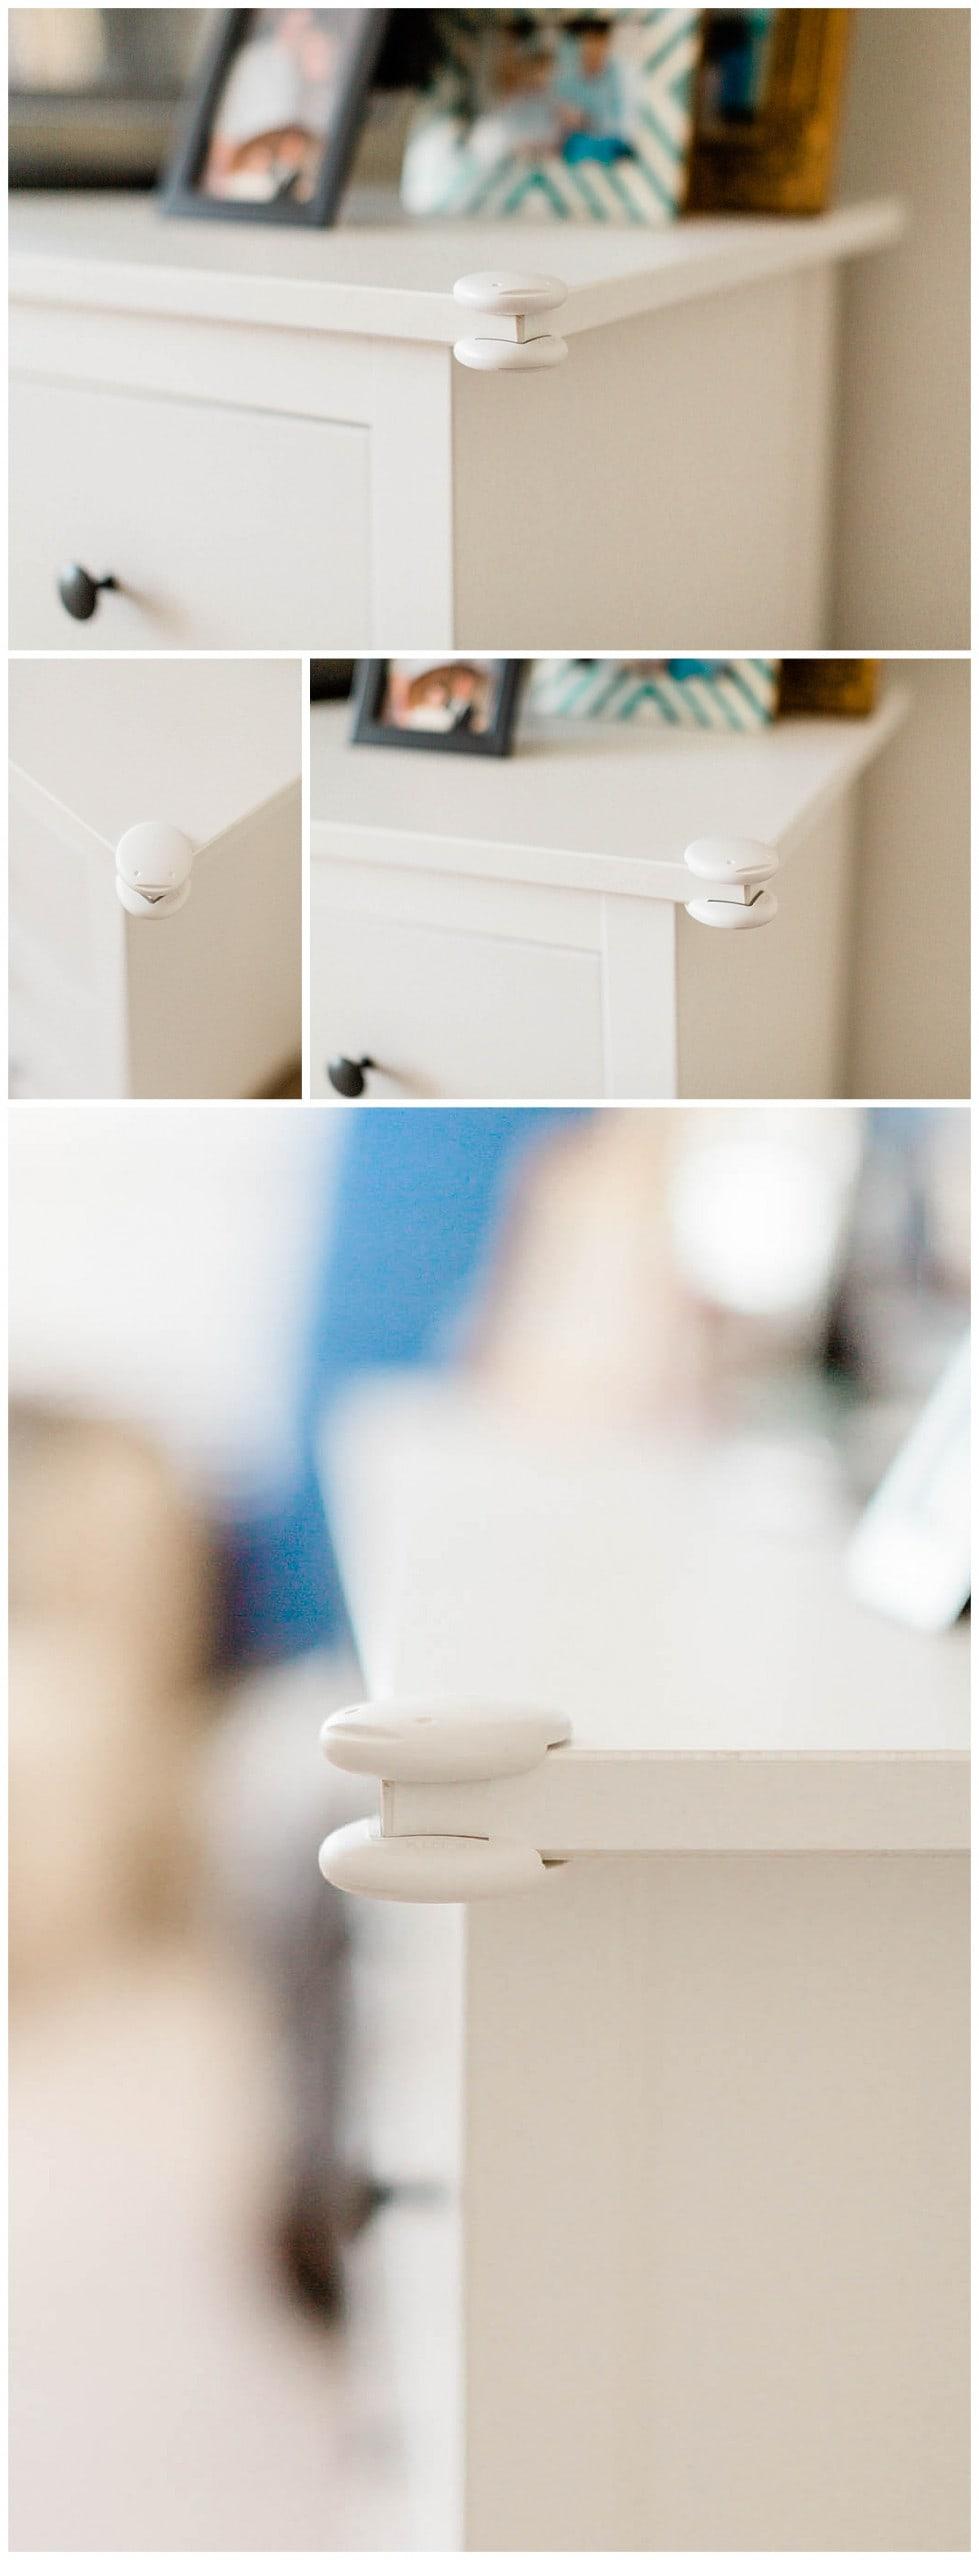 Qdos StayPut® Corner Protectors